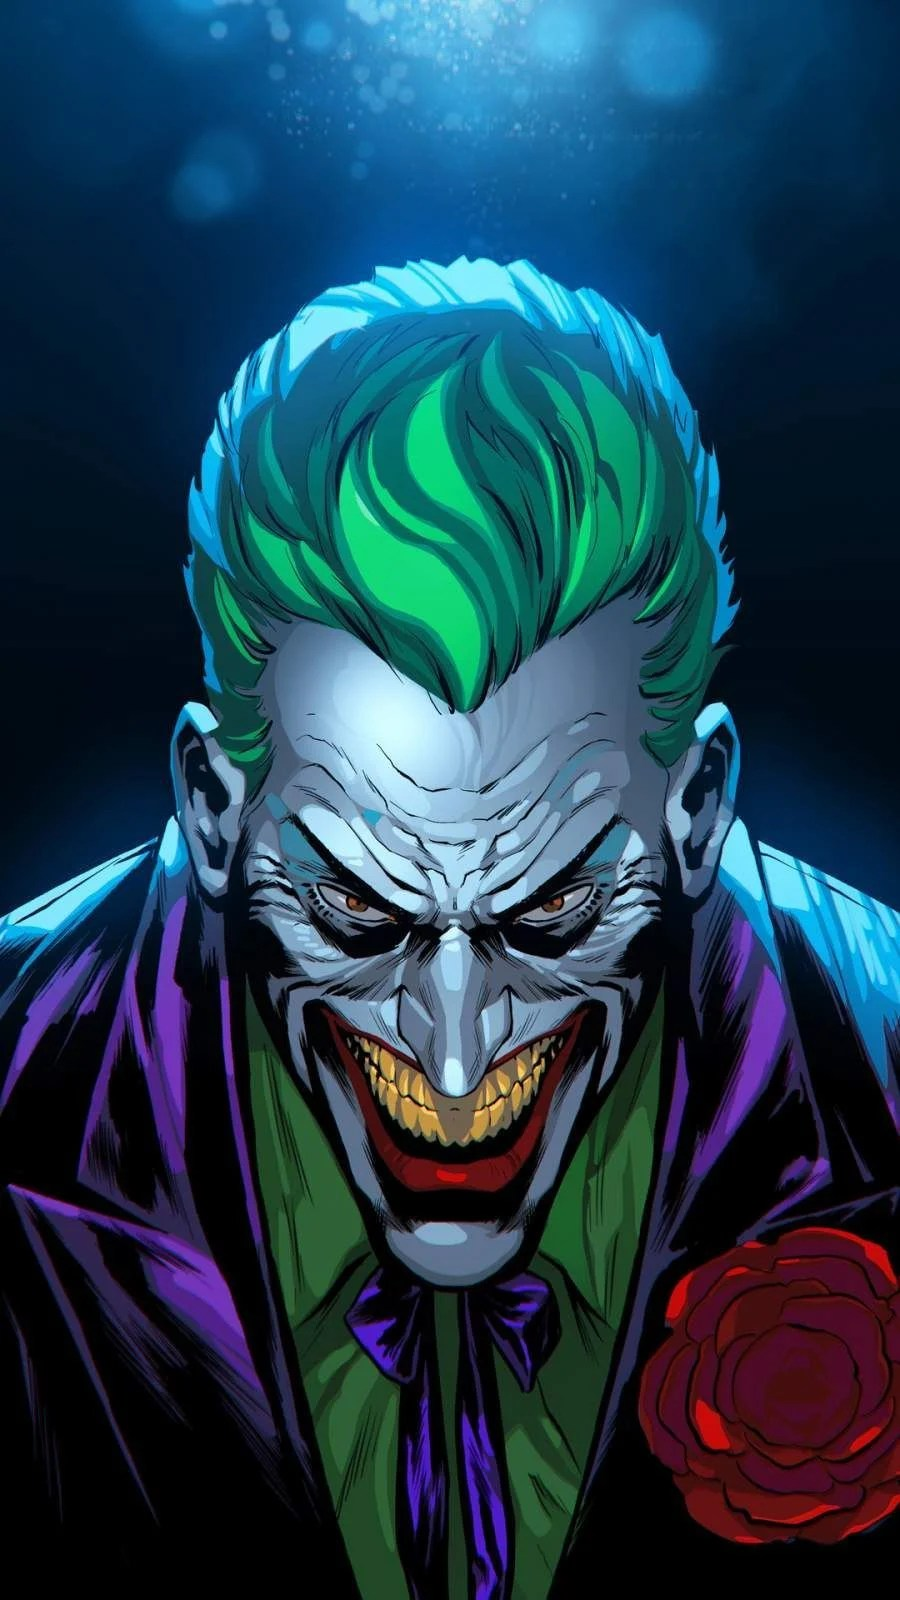 Joker Images Cartoon : joker, images, cartoon, Cartoon, Joker, Wallpapers, Wallpaper